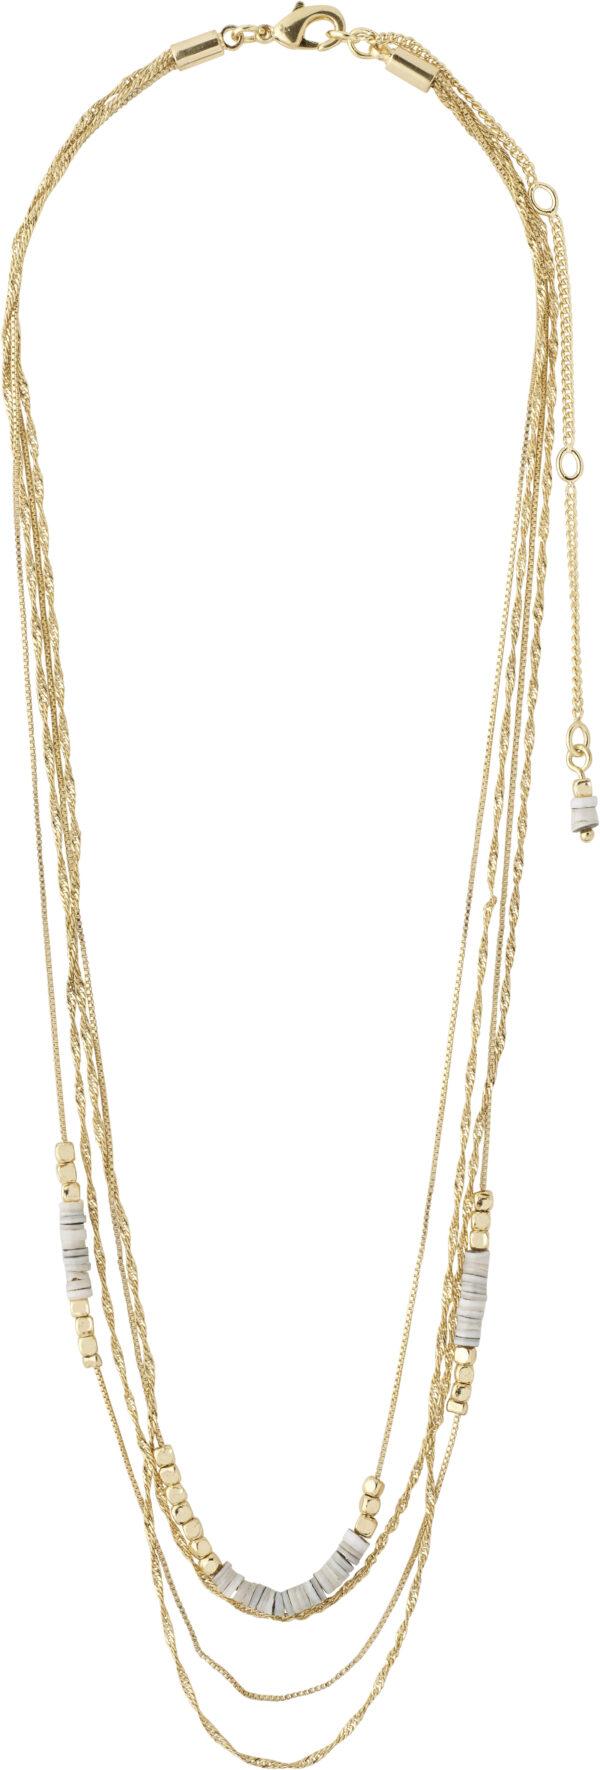 142122011 necklace sincerity gold plated grey karma pilgrim 2